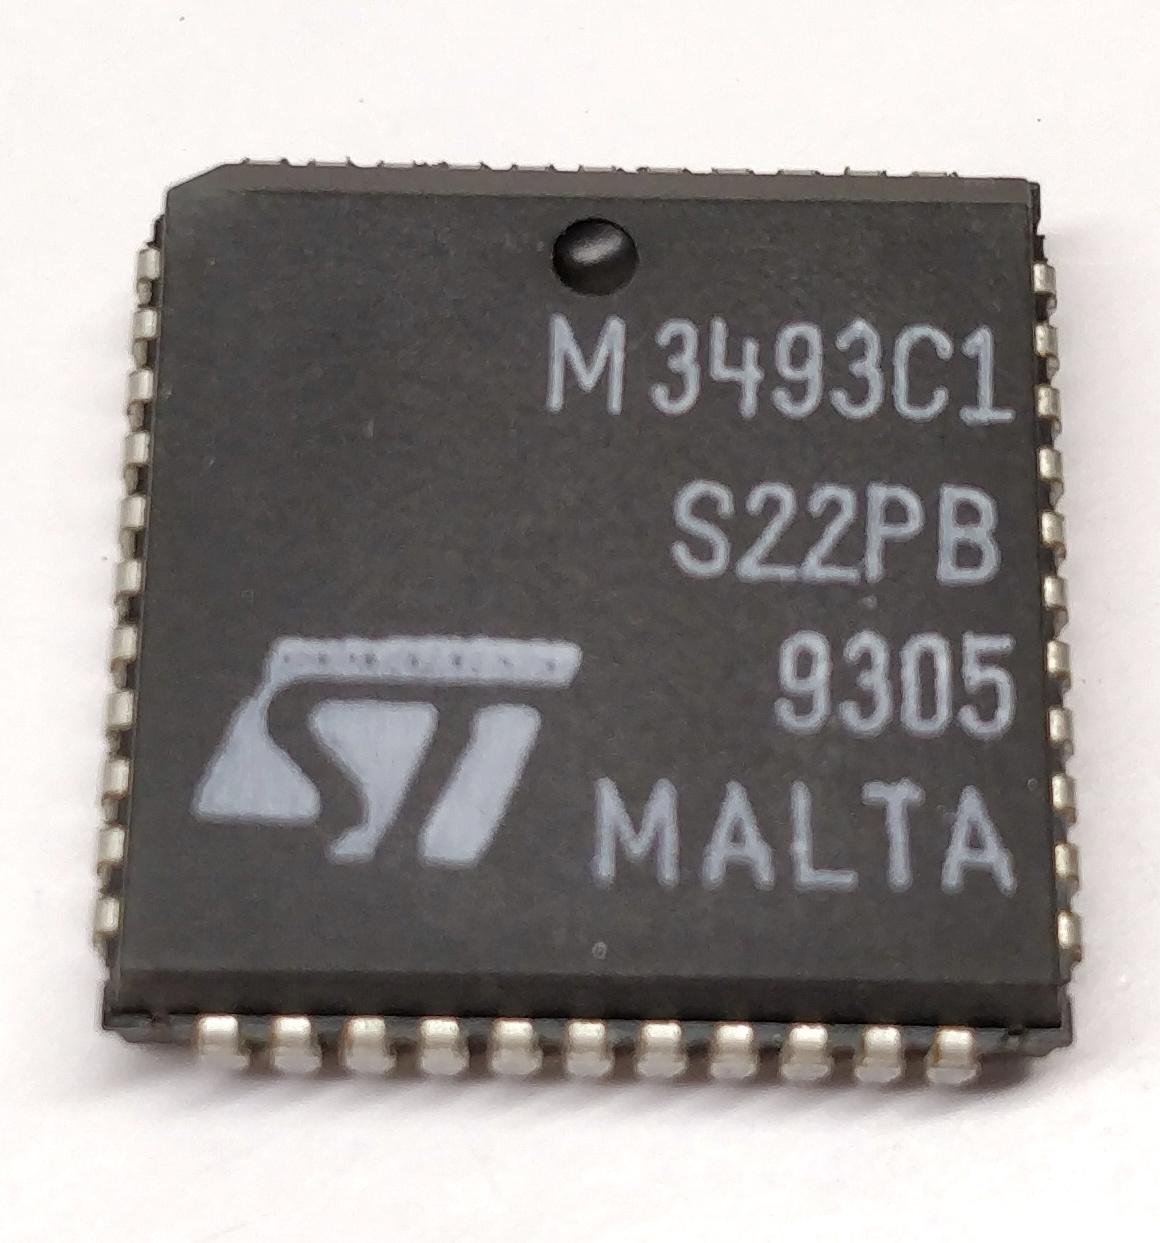 Control Memory cd22m3494sq 3 pezzi//3 pieces m3494b2 16 x 8 Crosspoint W